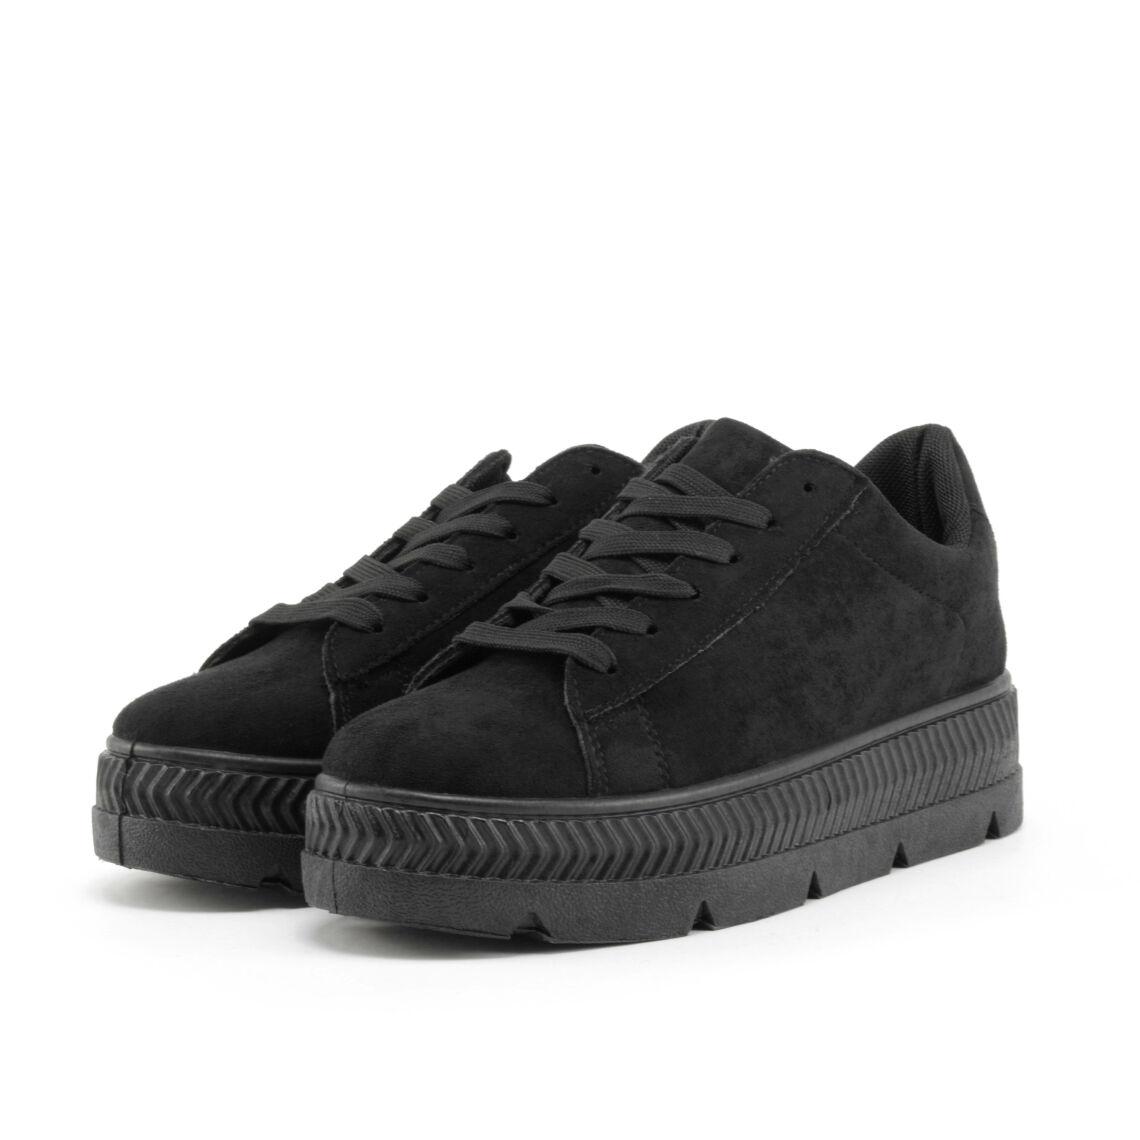 62ad49fc7392 Fekete Női Művelúr Utcai Cipő - MAGAS TALPÚ - Női cipő webáruház-női ...